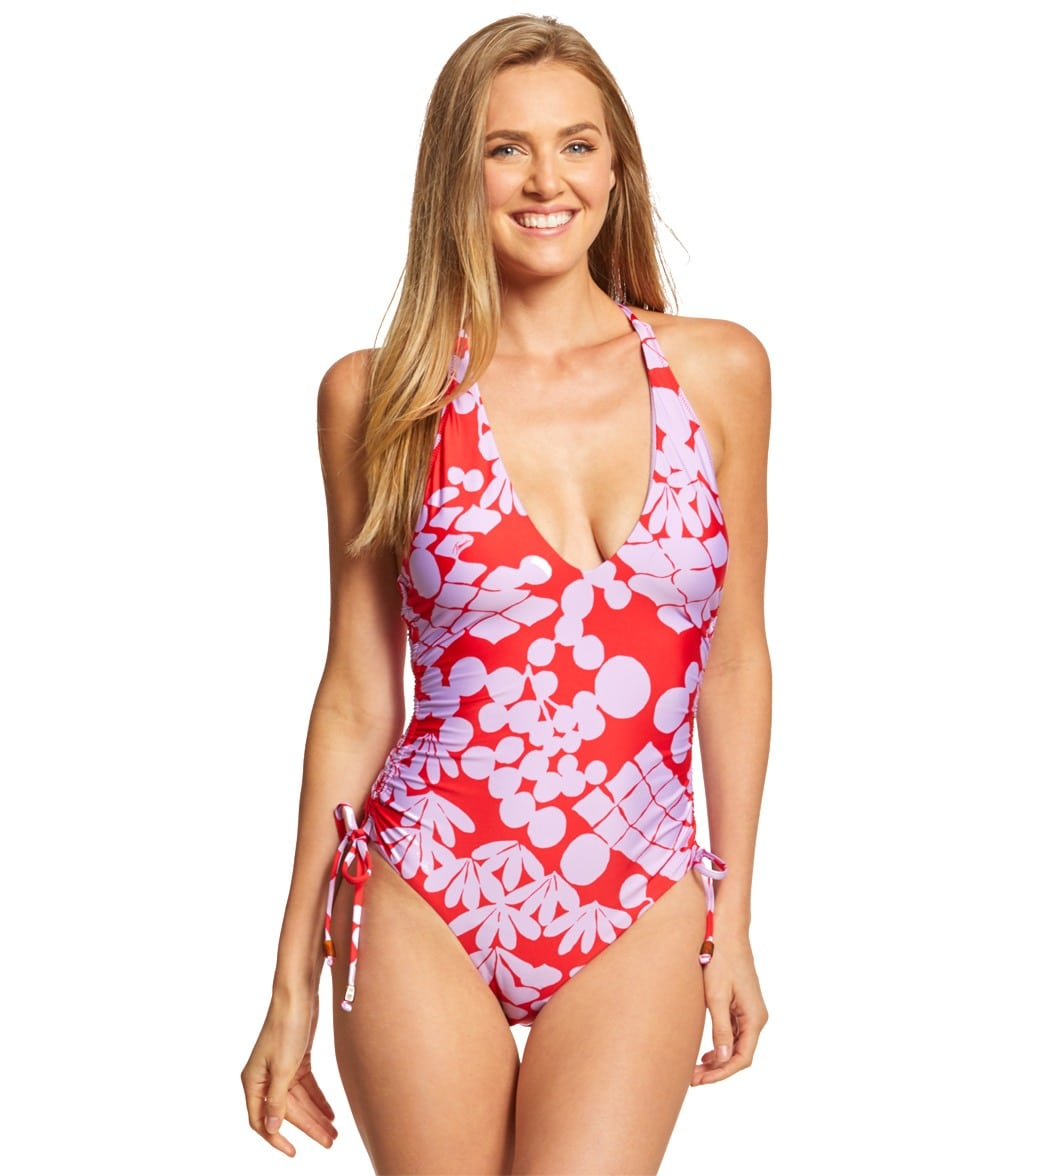 c3ec4b1f60182 Trina Turk Bali Blossoms High Leg One Piece Swimsuit at SwimOutlet.com -  Free Shipping